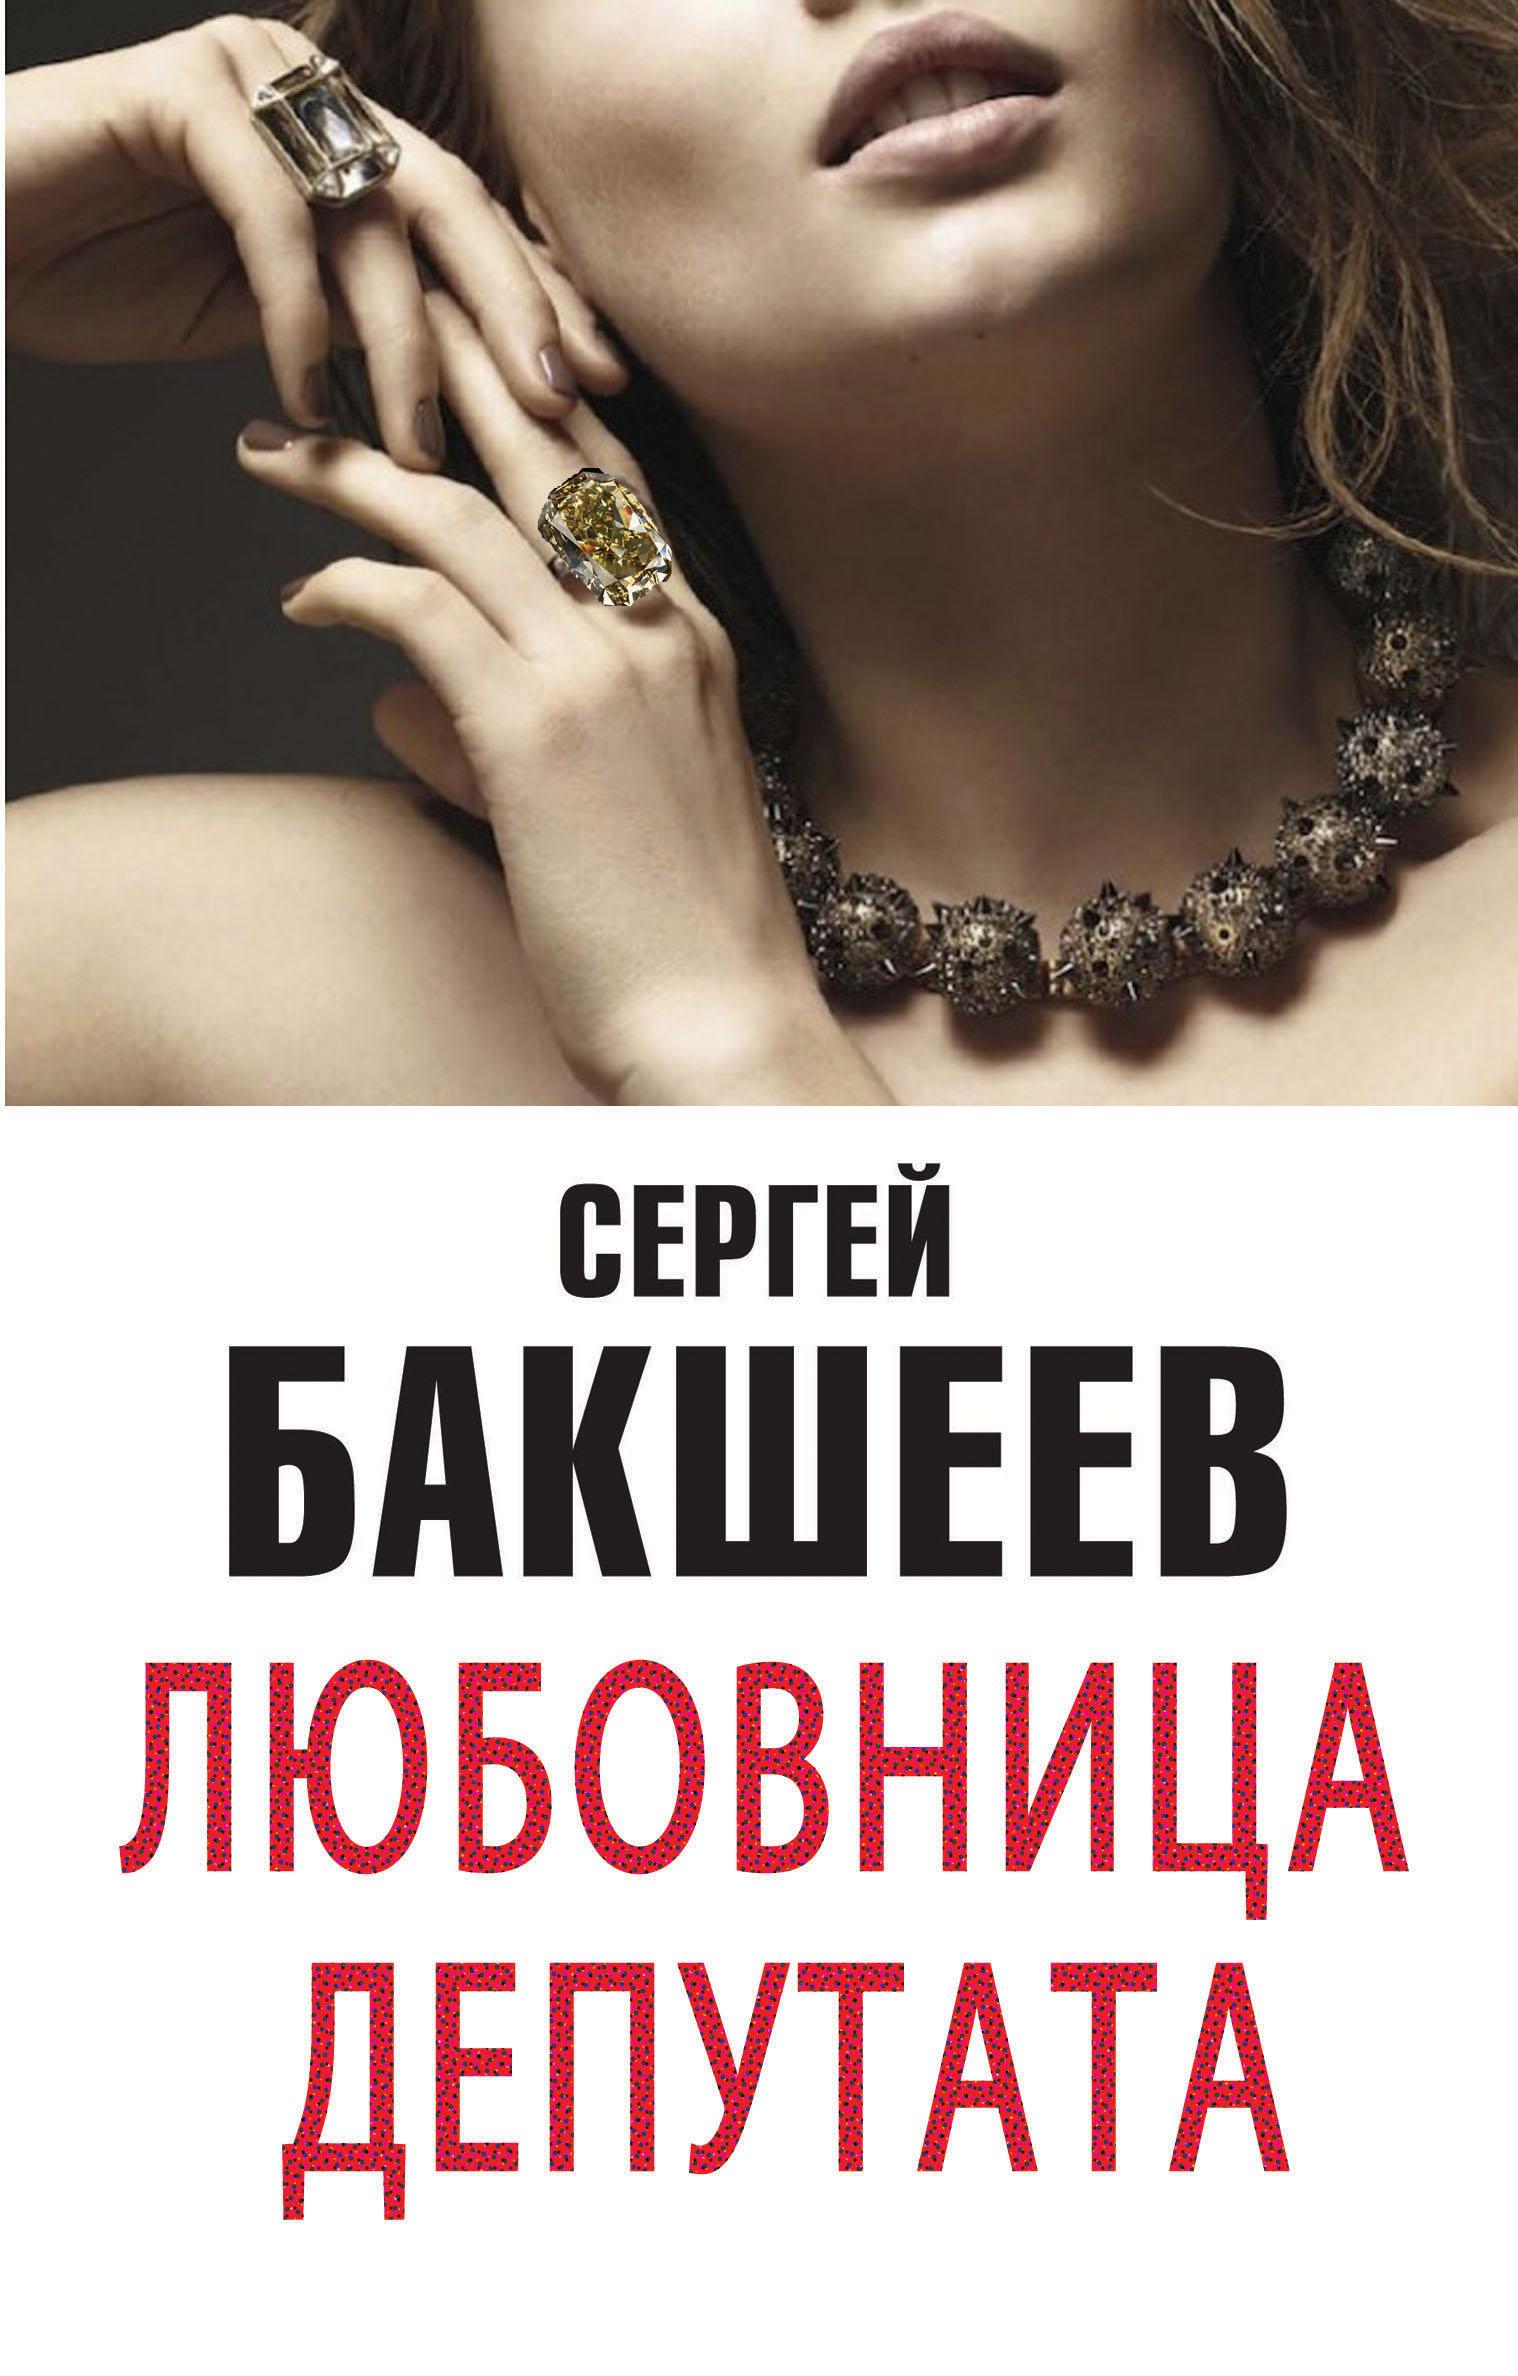 Сергей Бакшеев Любовница депутата (сборник) цены онлайн